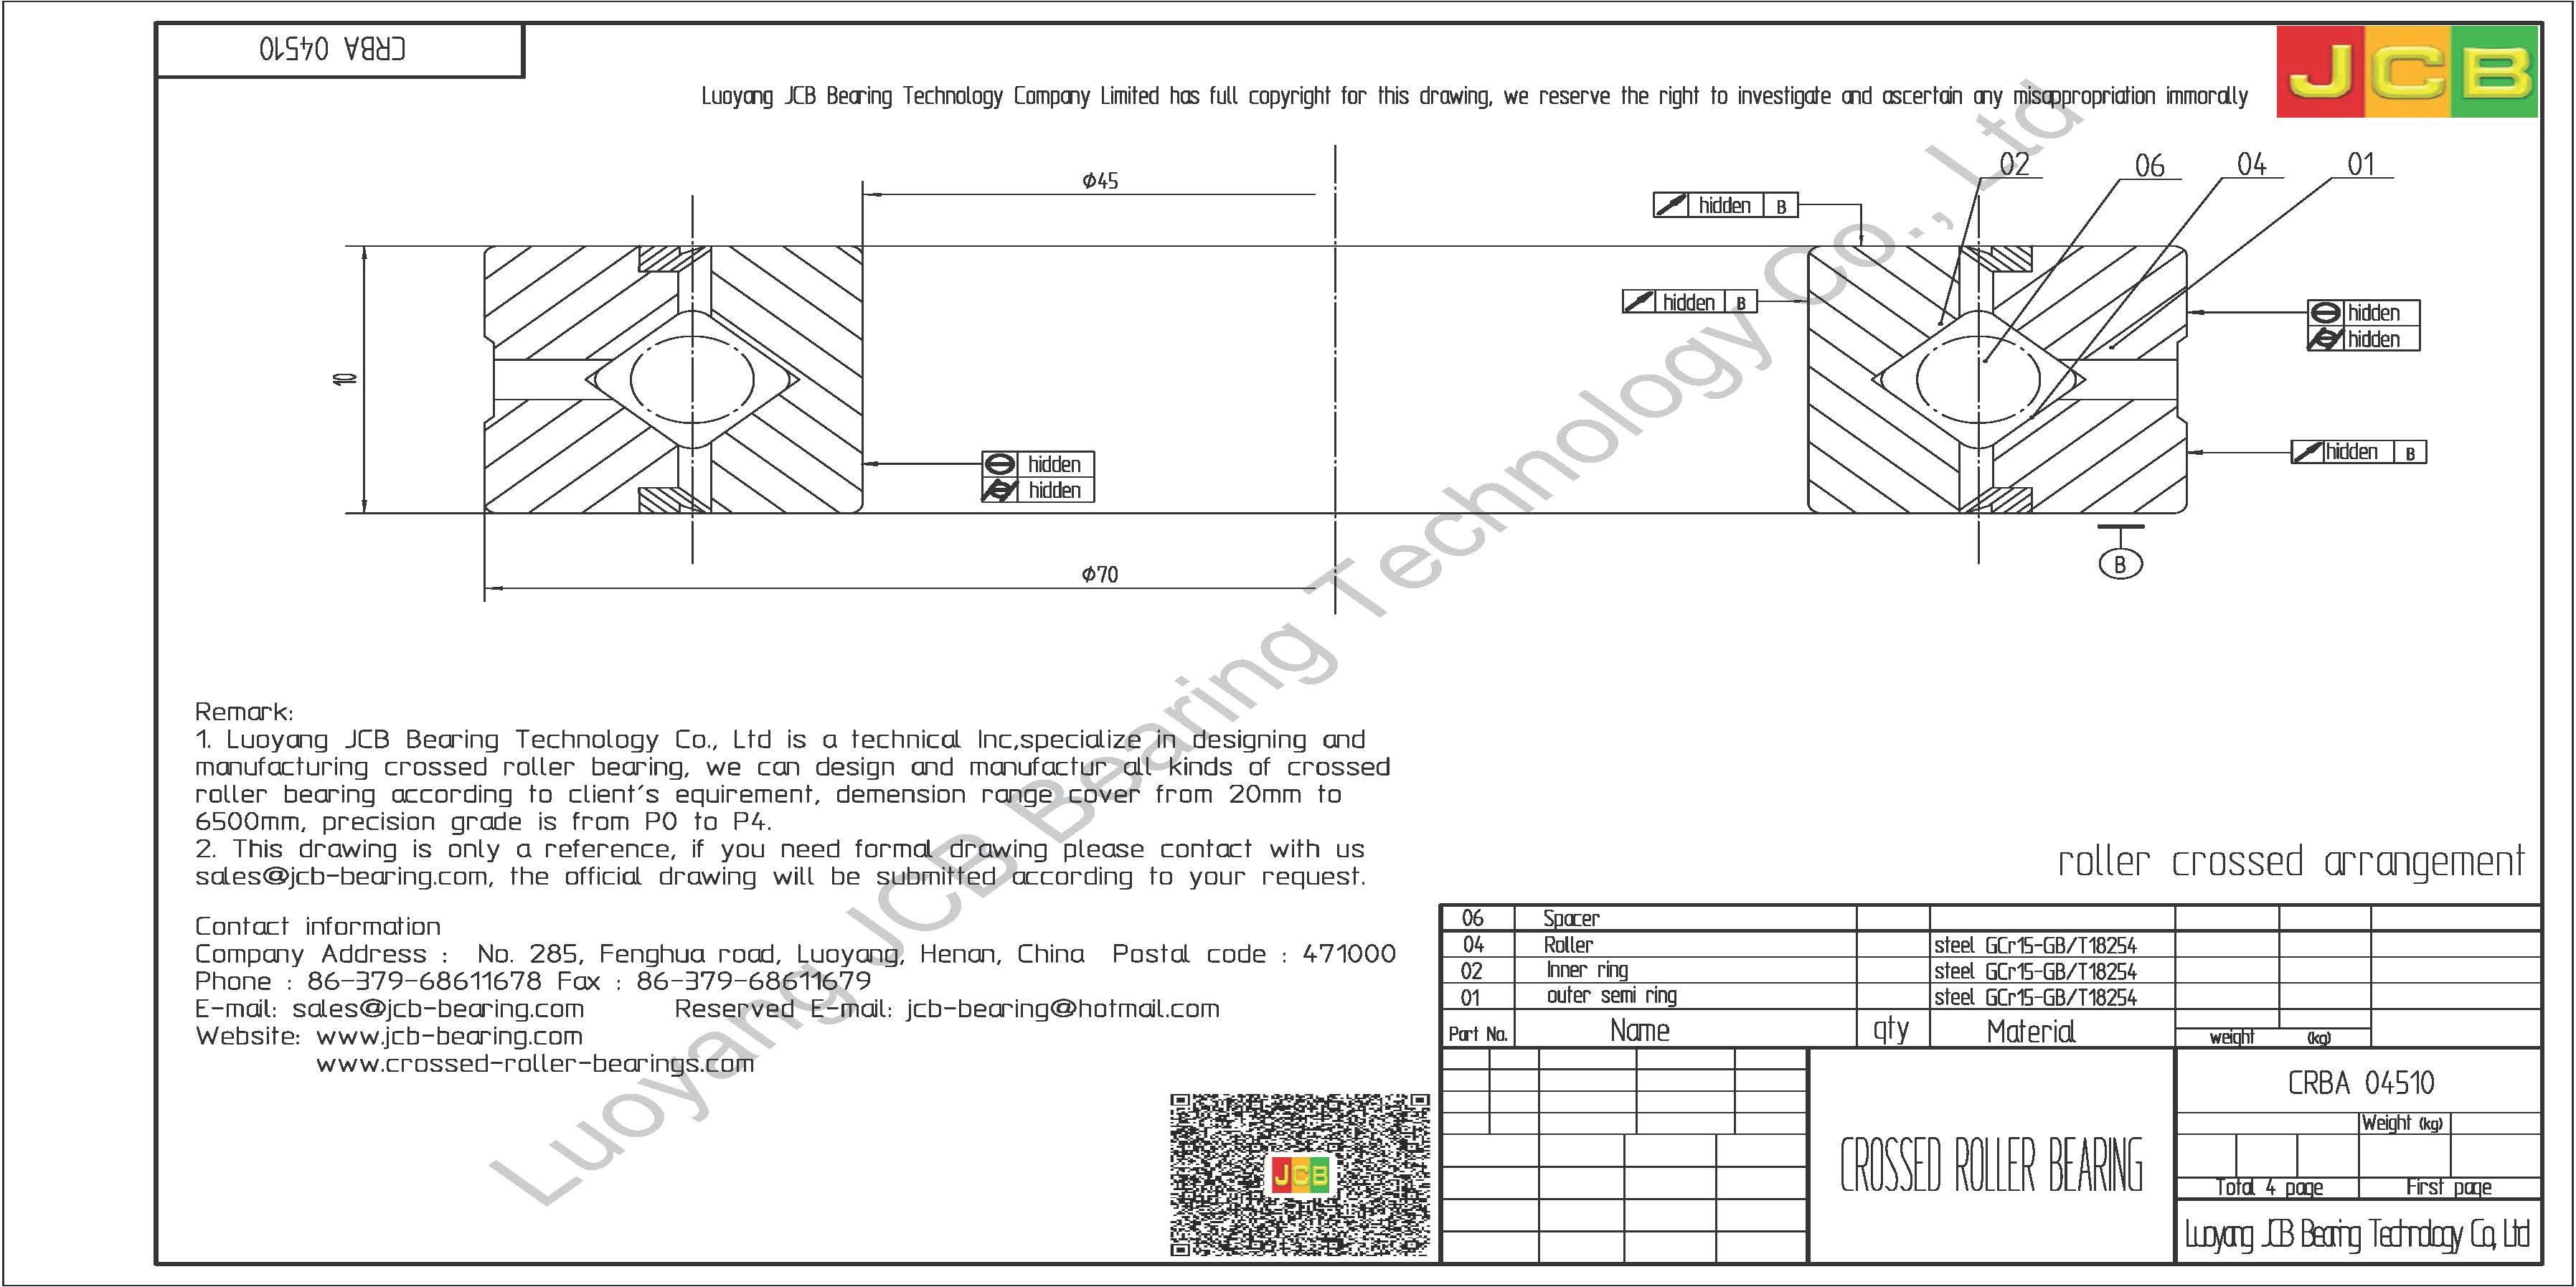 CRBA 04510 HIWIN CROSSED ROLLER BEARING